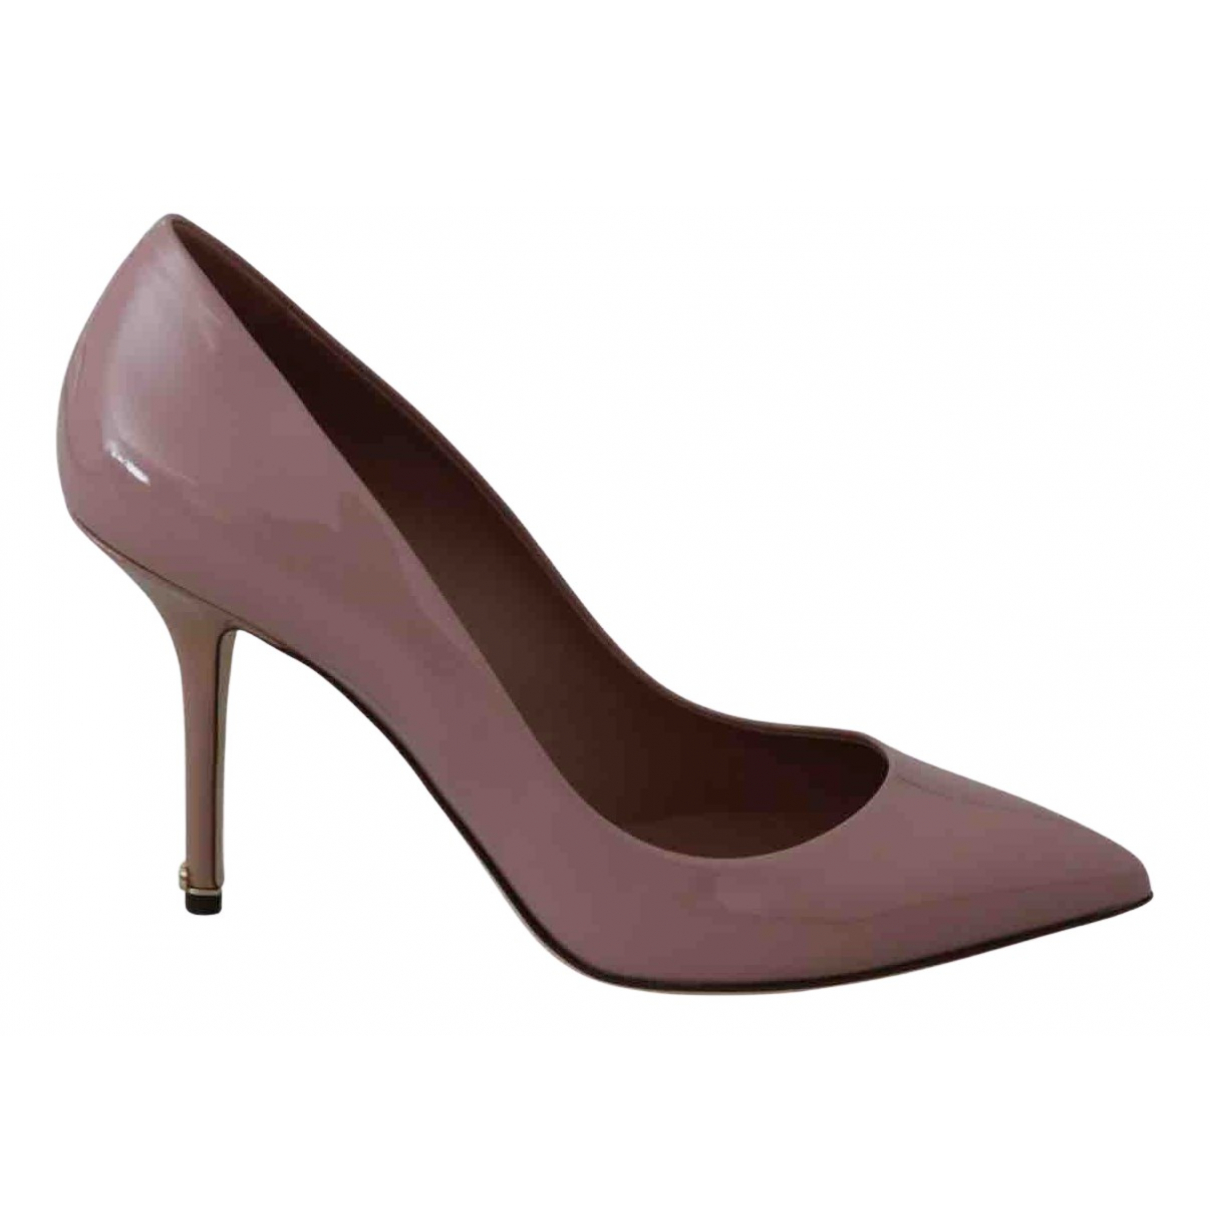 Dolce & Gabbana N Pink Patent leather Heels for Women 39 EU